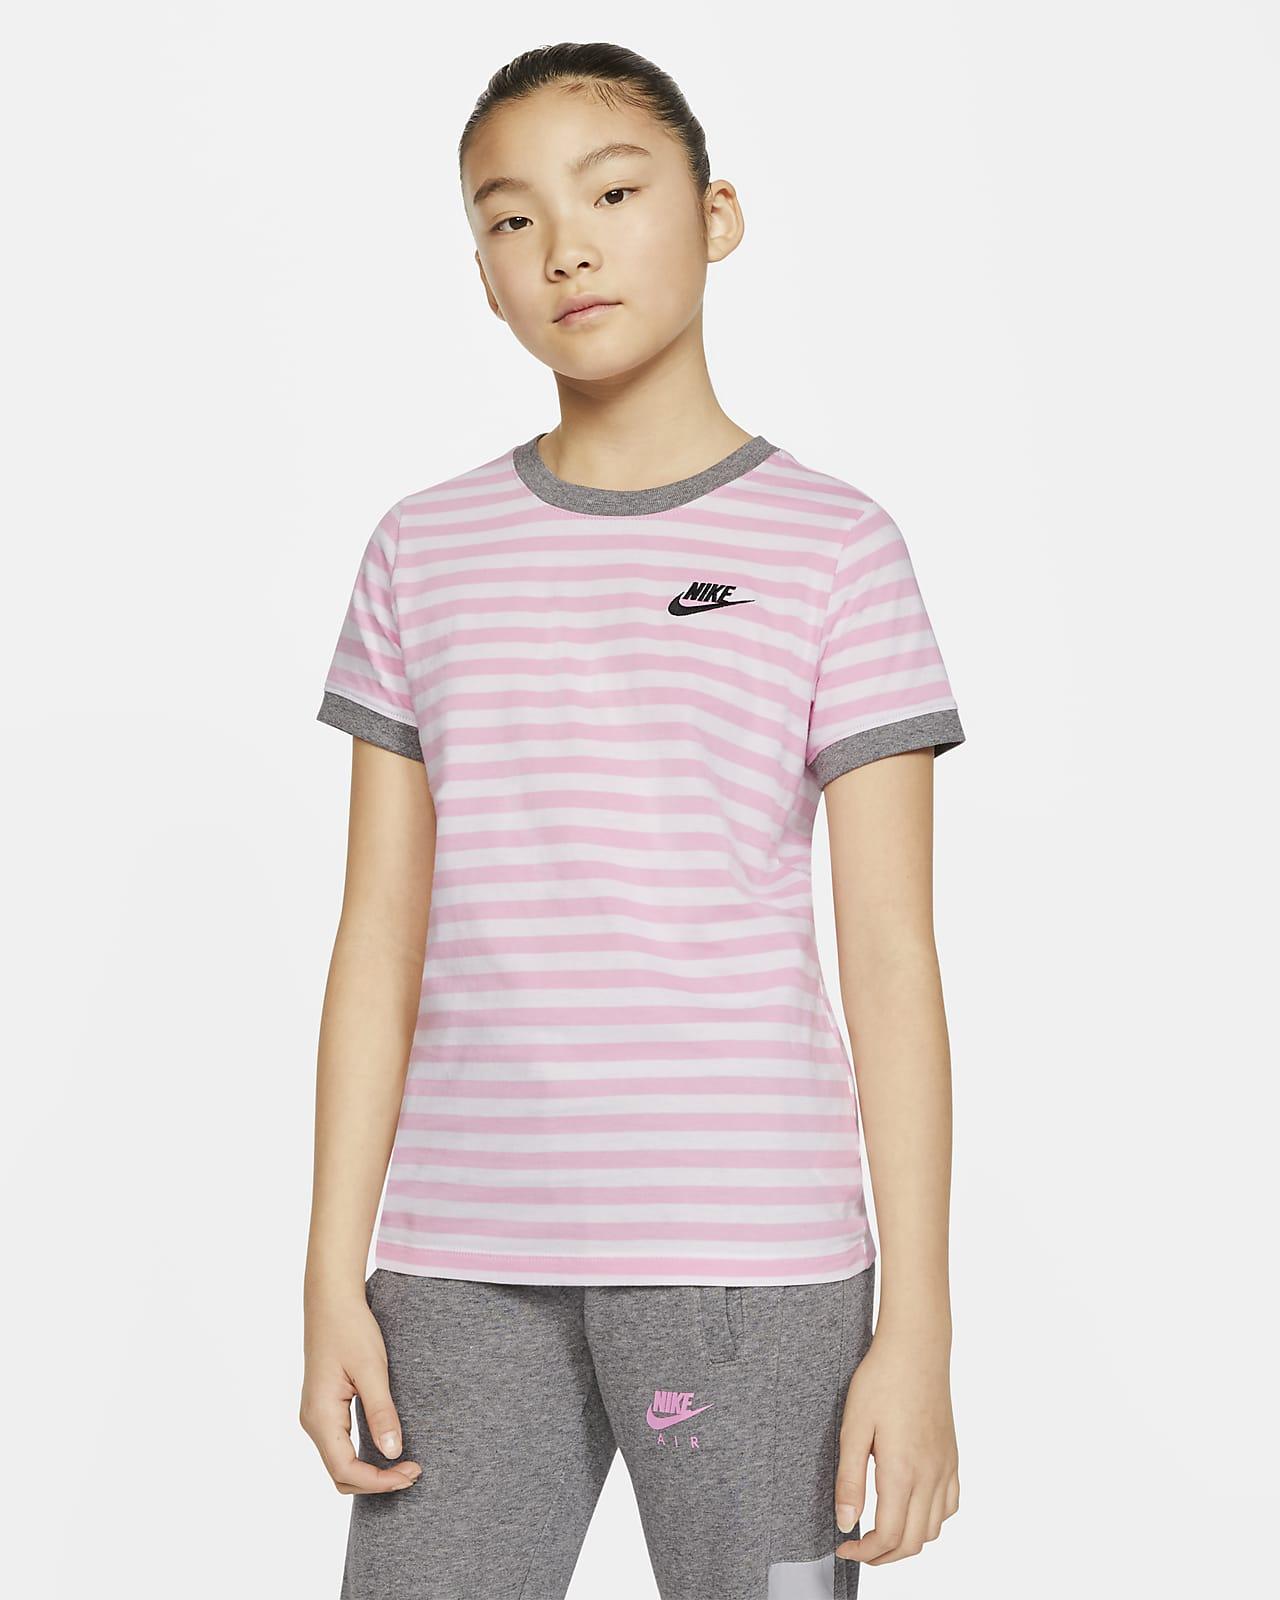 Nike Sportswear-T-shirt til store børn (piger)